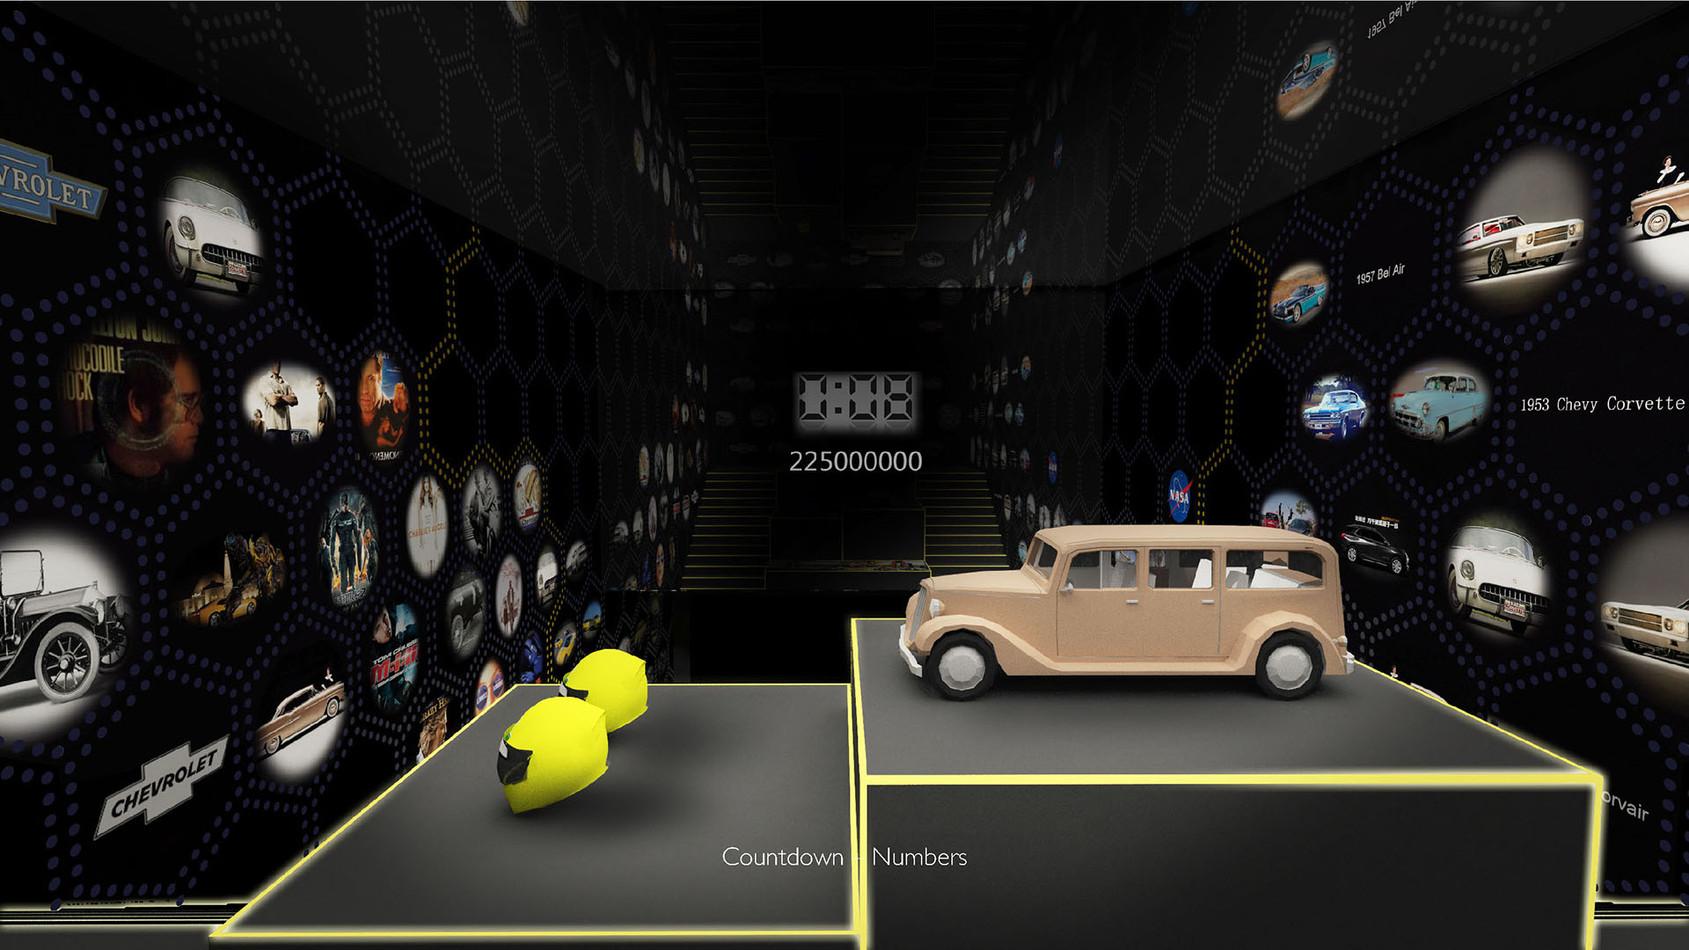 SGM-CORPORATE-MUSEUM-EN 44.jpg